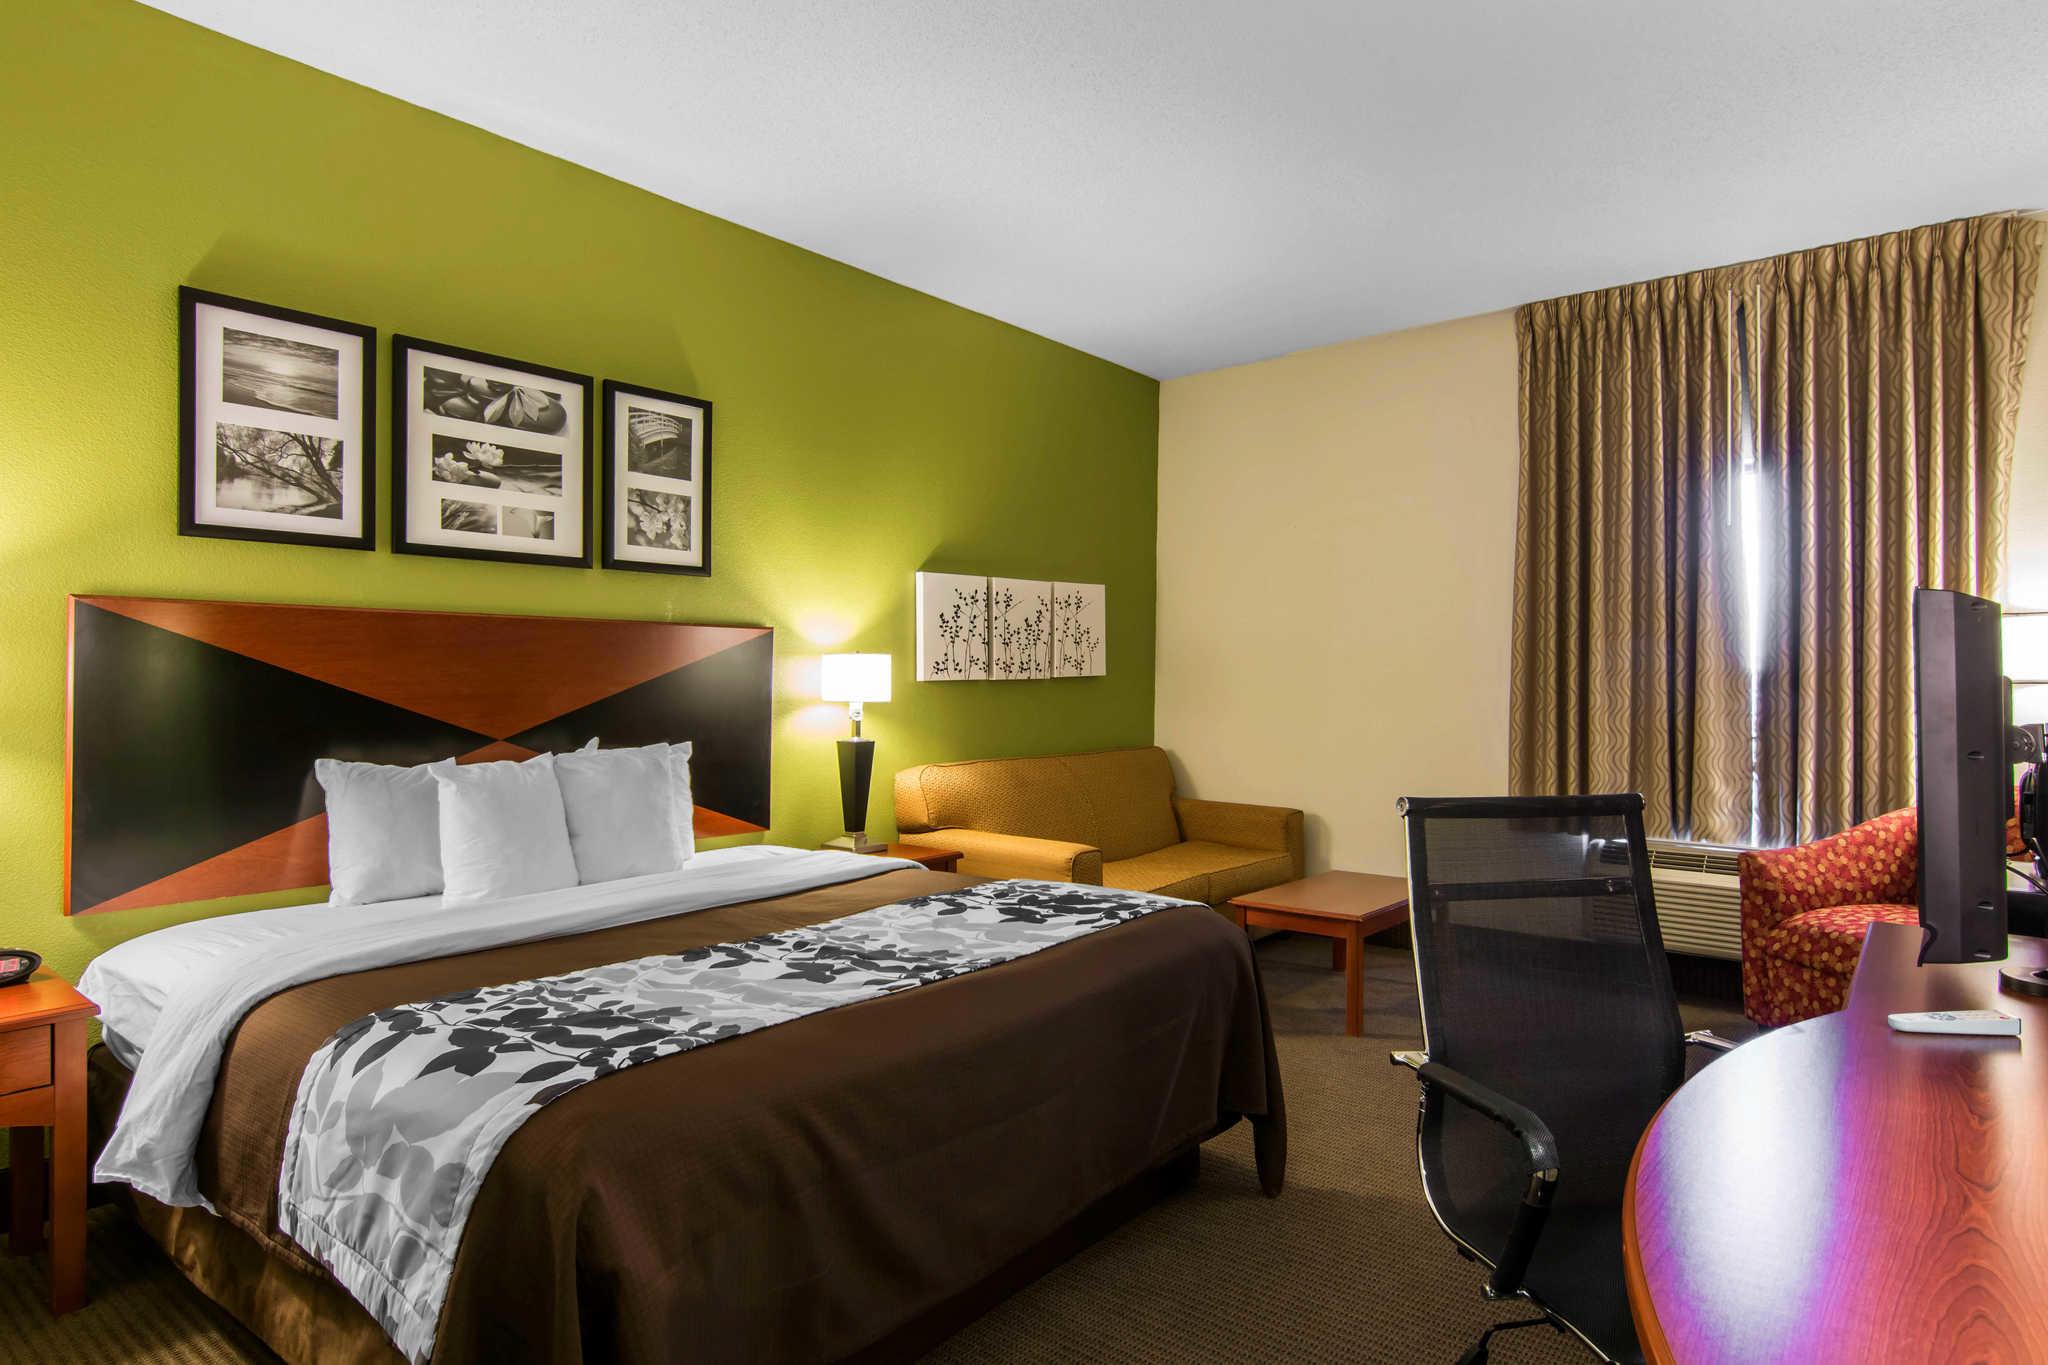 Sleep Inn & Suites At Fort Lee image 8